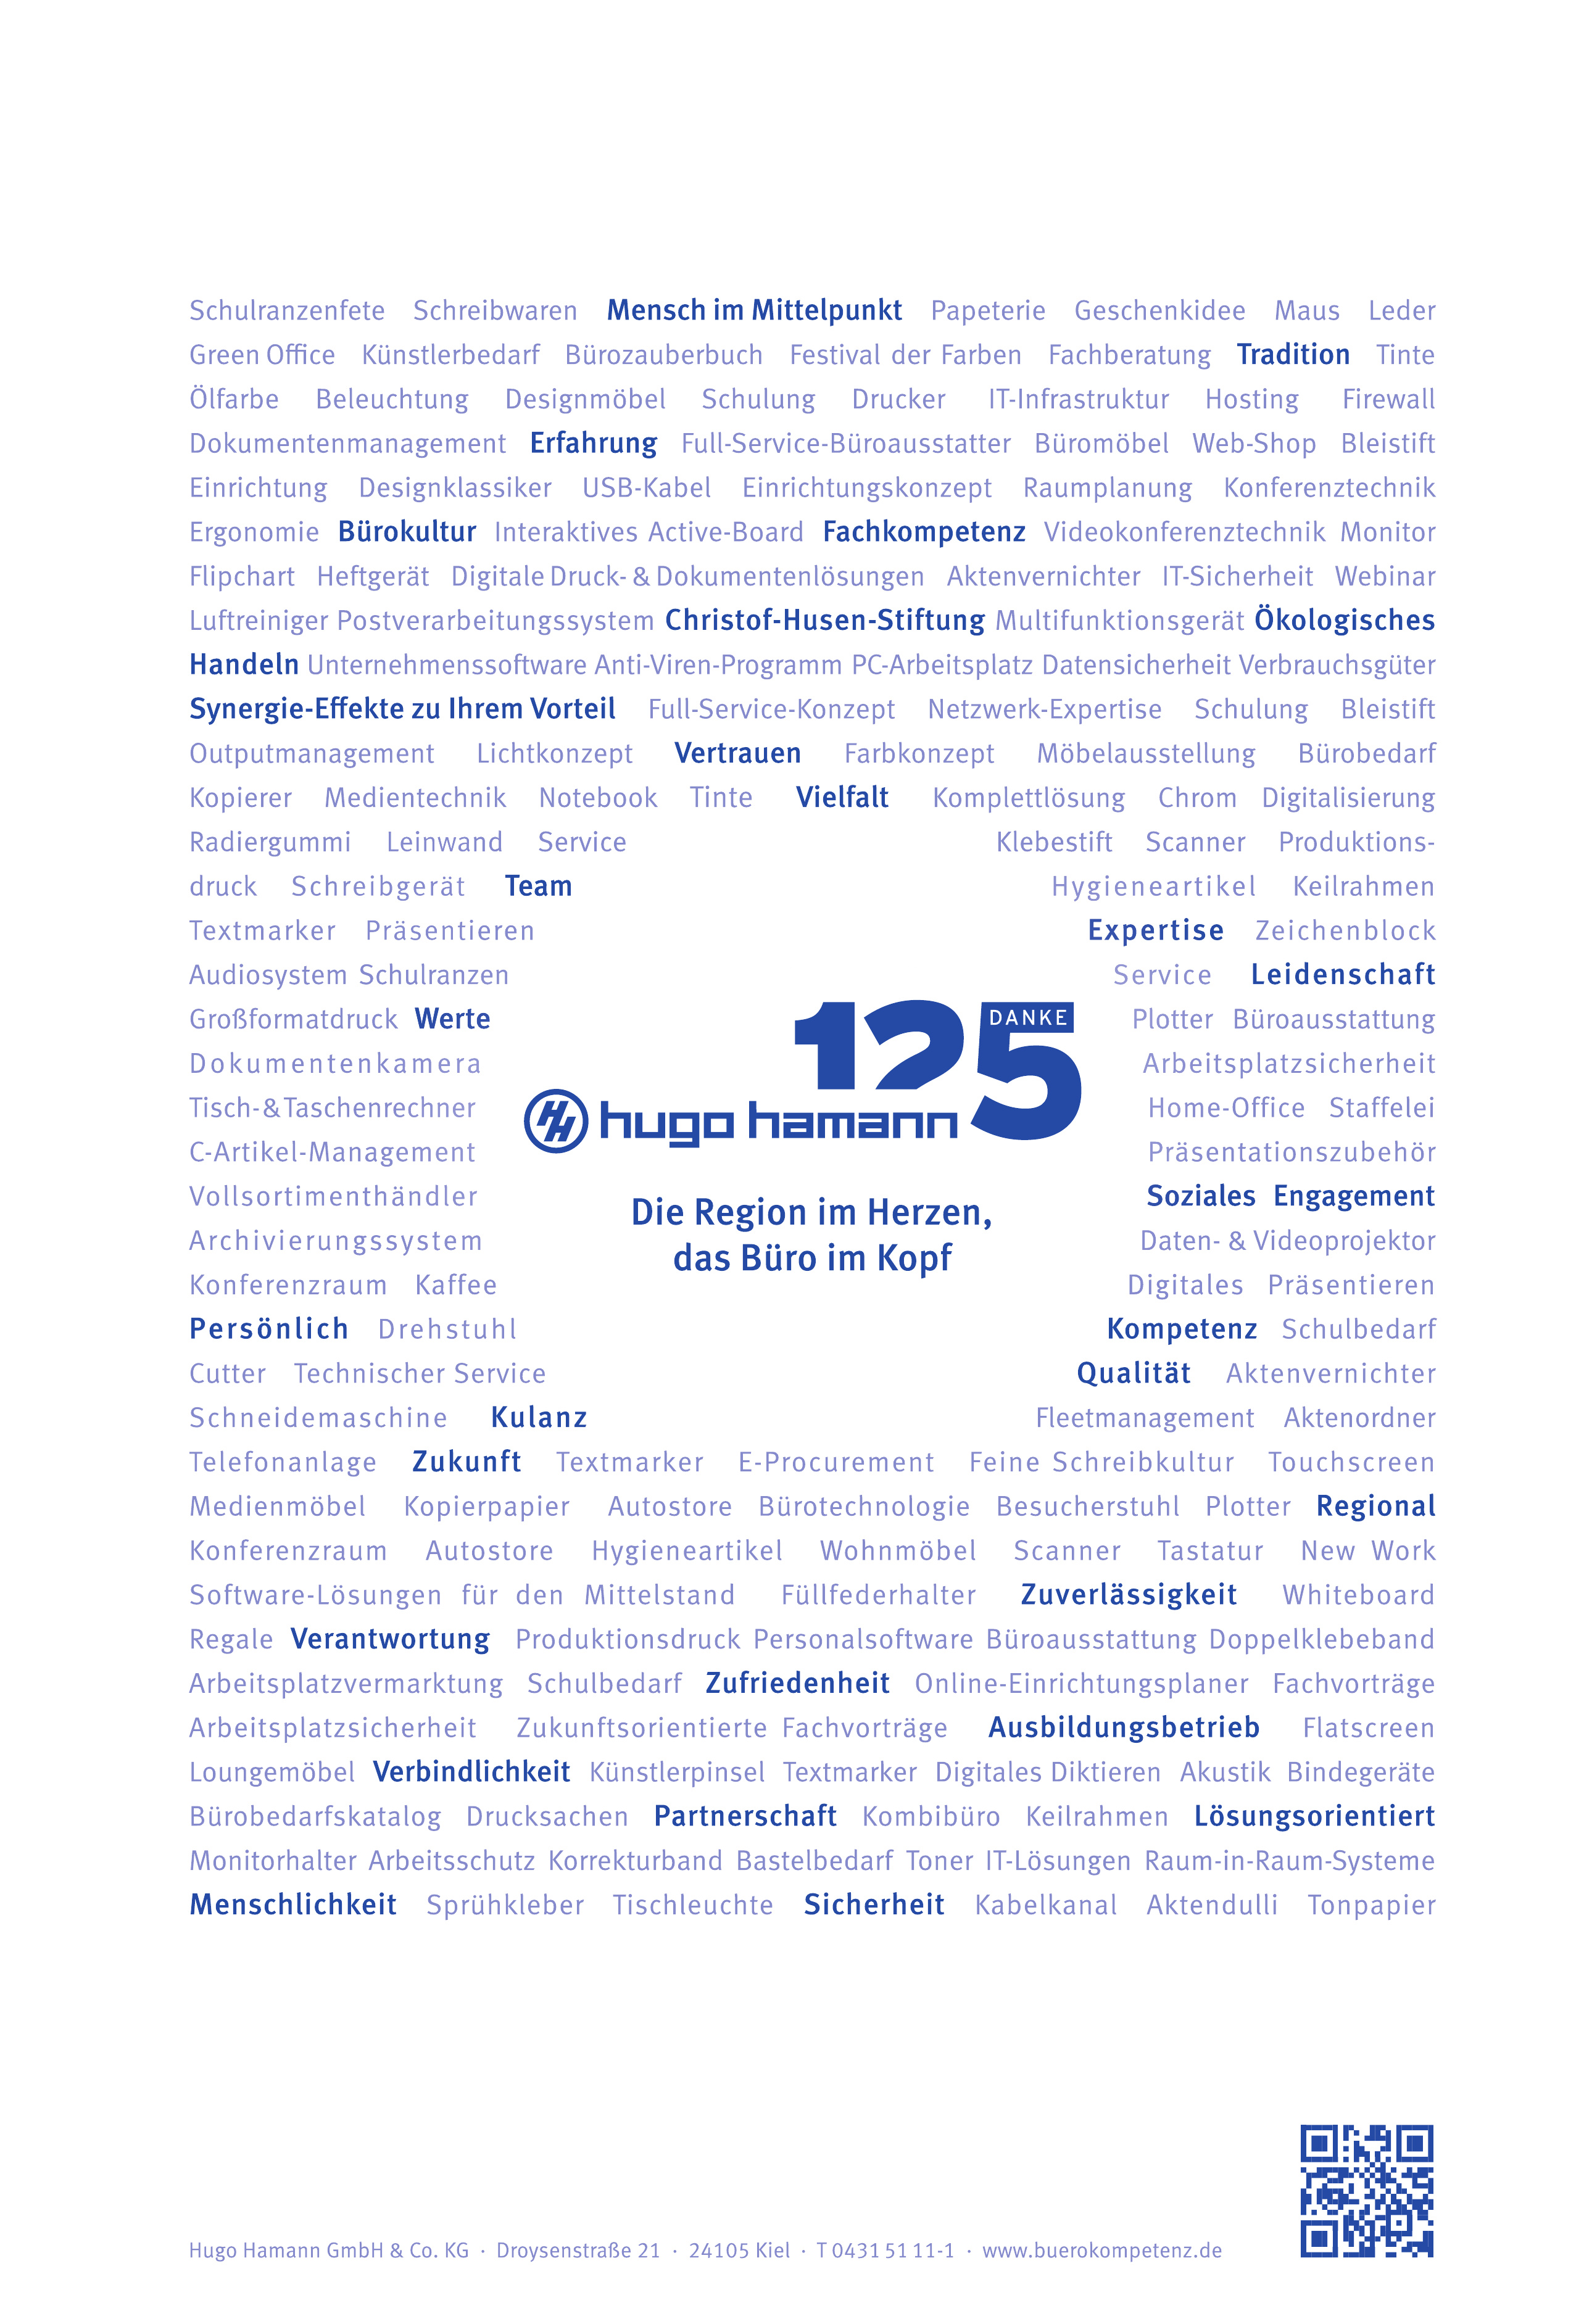 Hugo Hamann GmbH & Co. KG